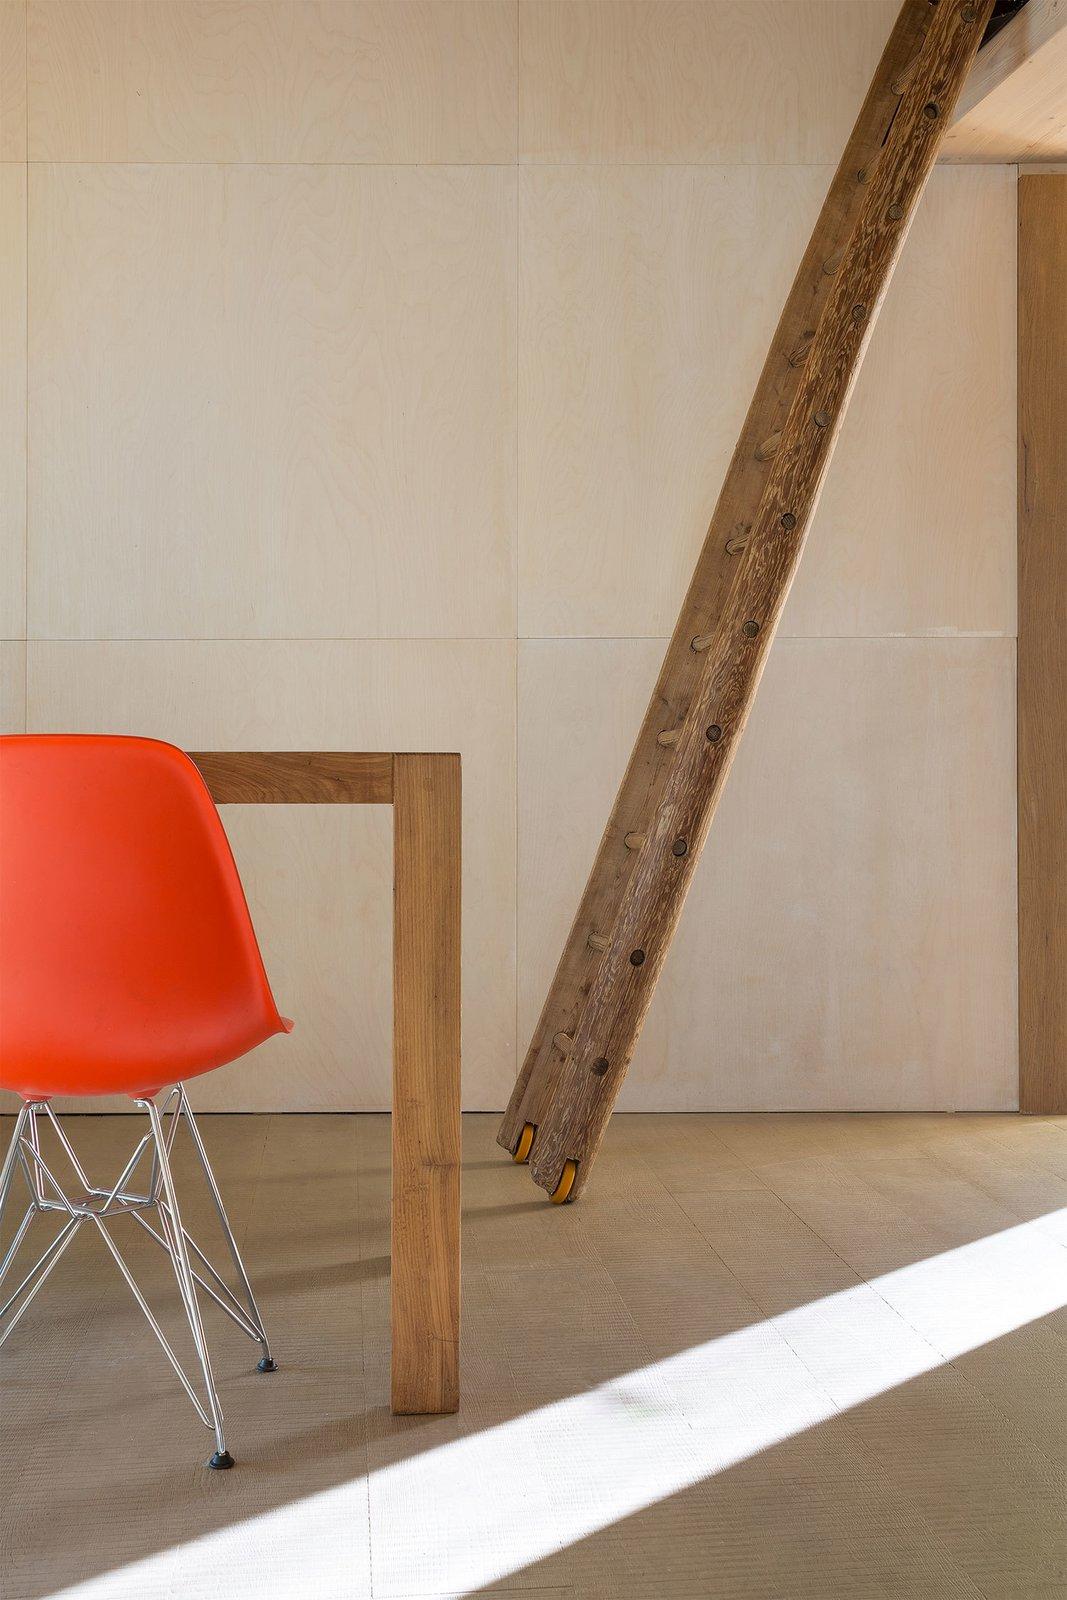 Mountain Stone House by Vudafieri Saverino Partners.